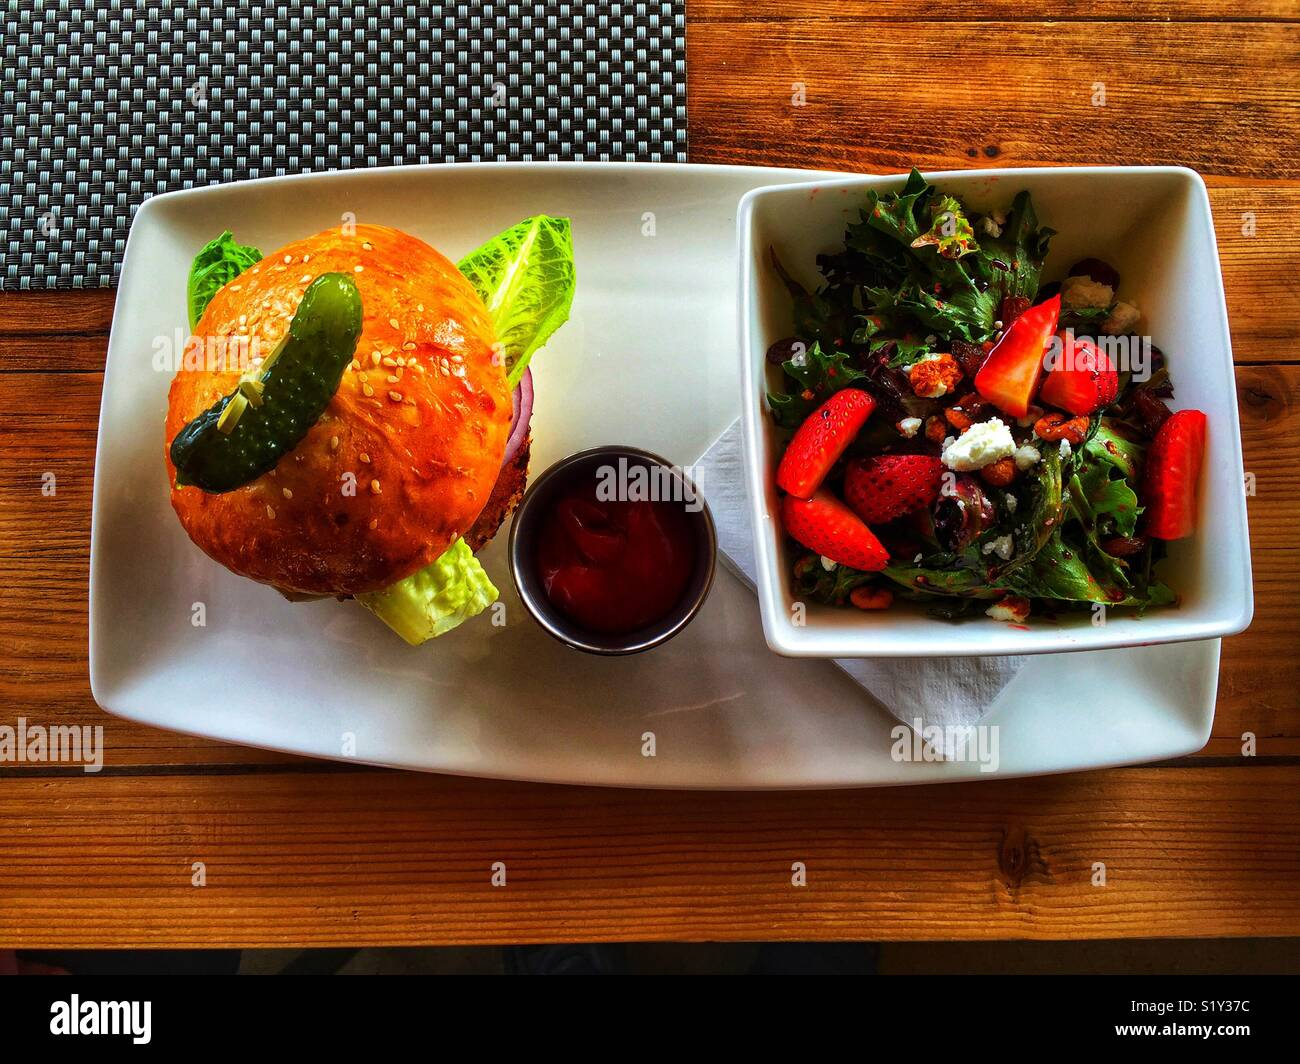 Bison burger and salad - Stock Image